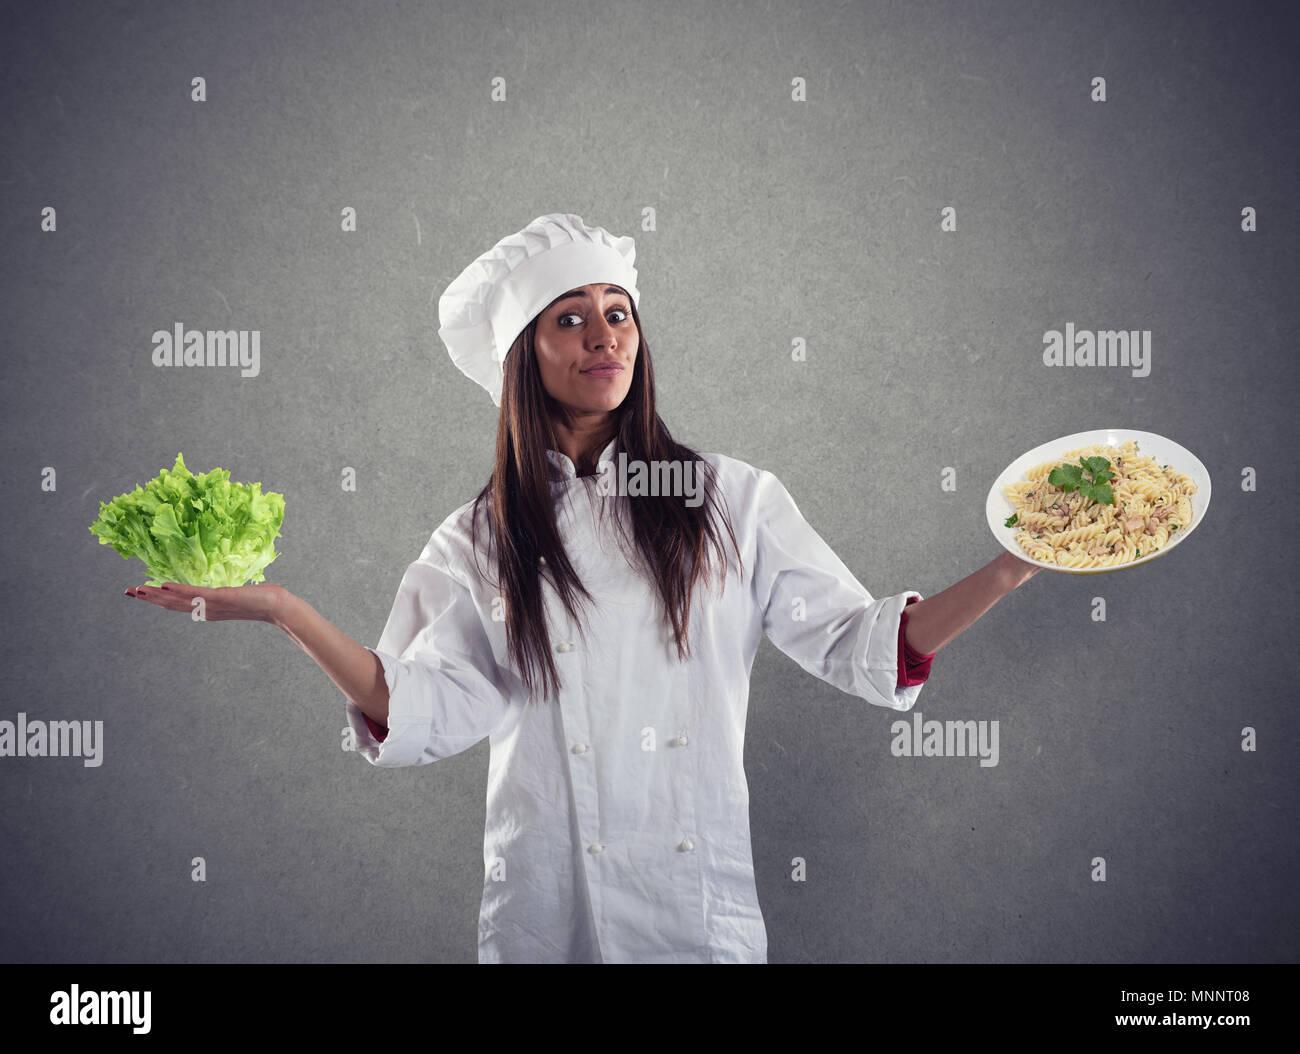 Chef indeciso entre ensalada fresca o plato de pasta Imagen De Stock